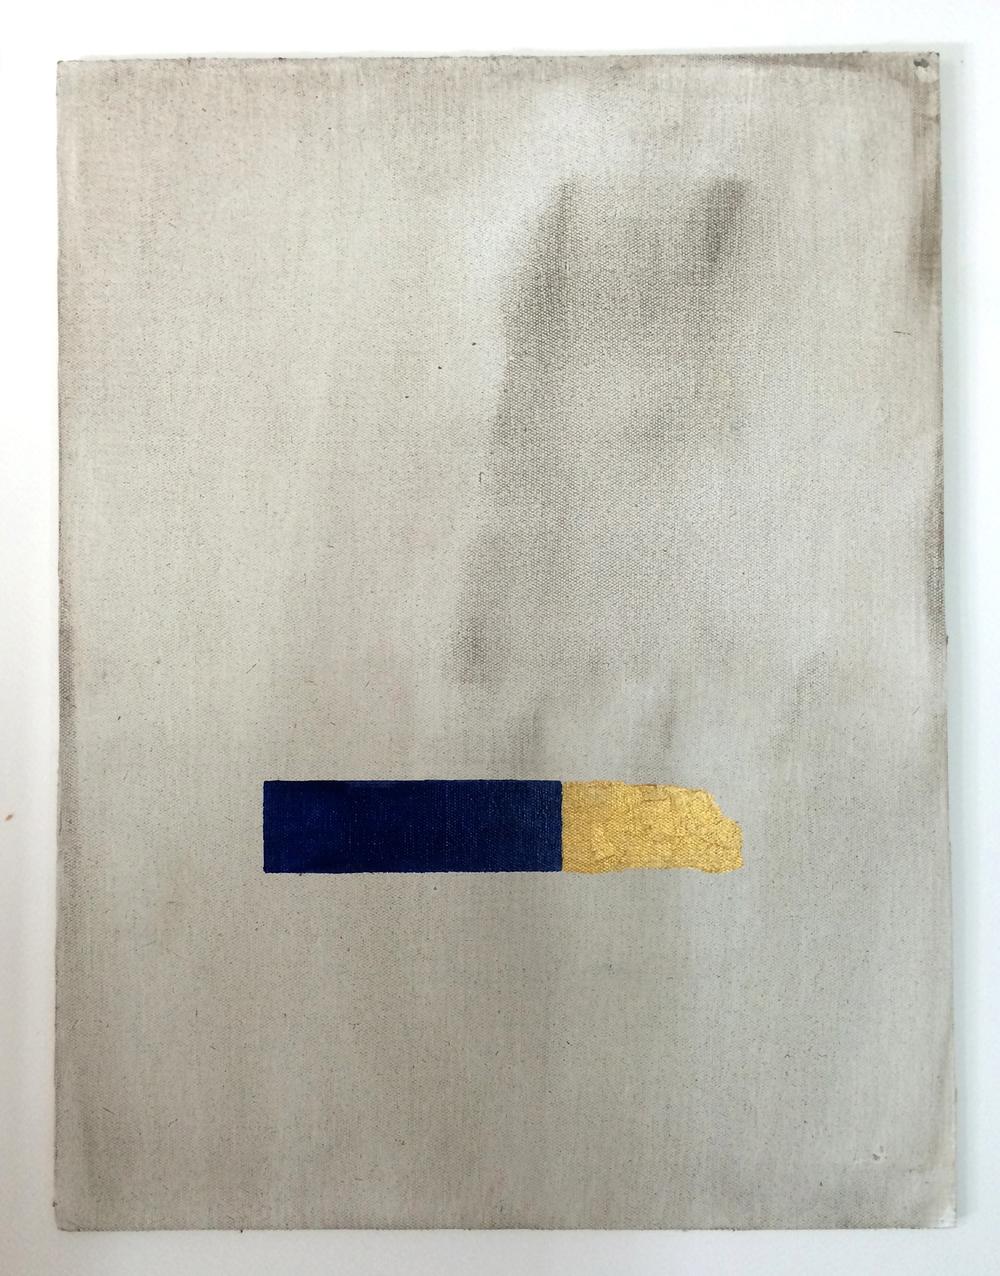 Unconscious 2, 40 x 30 cms, óleo sobre lienzo